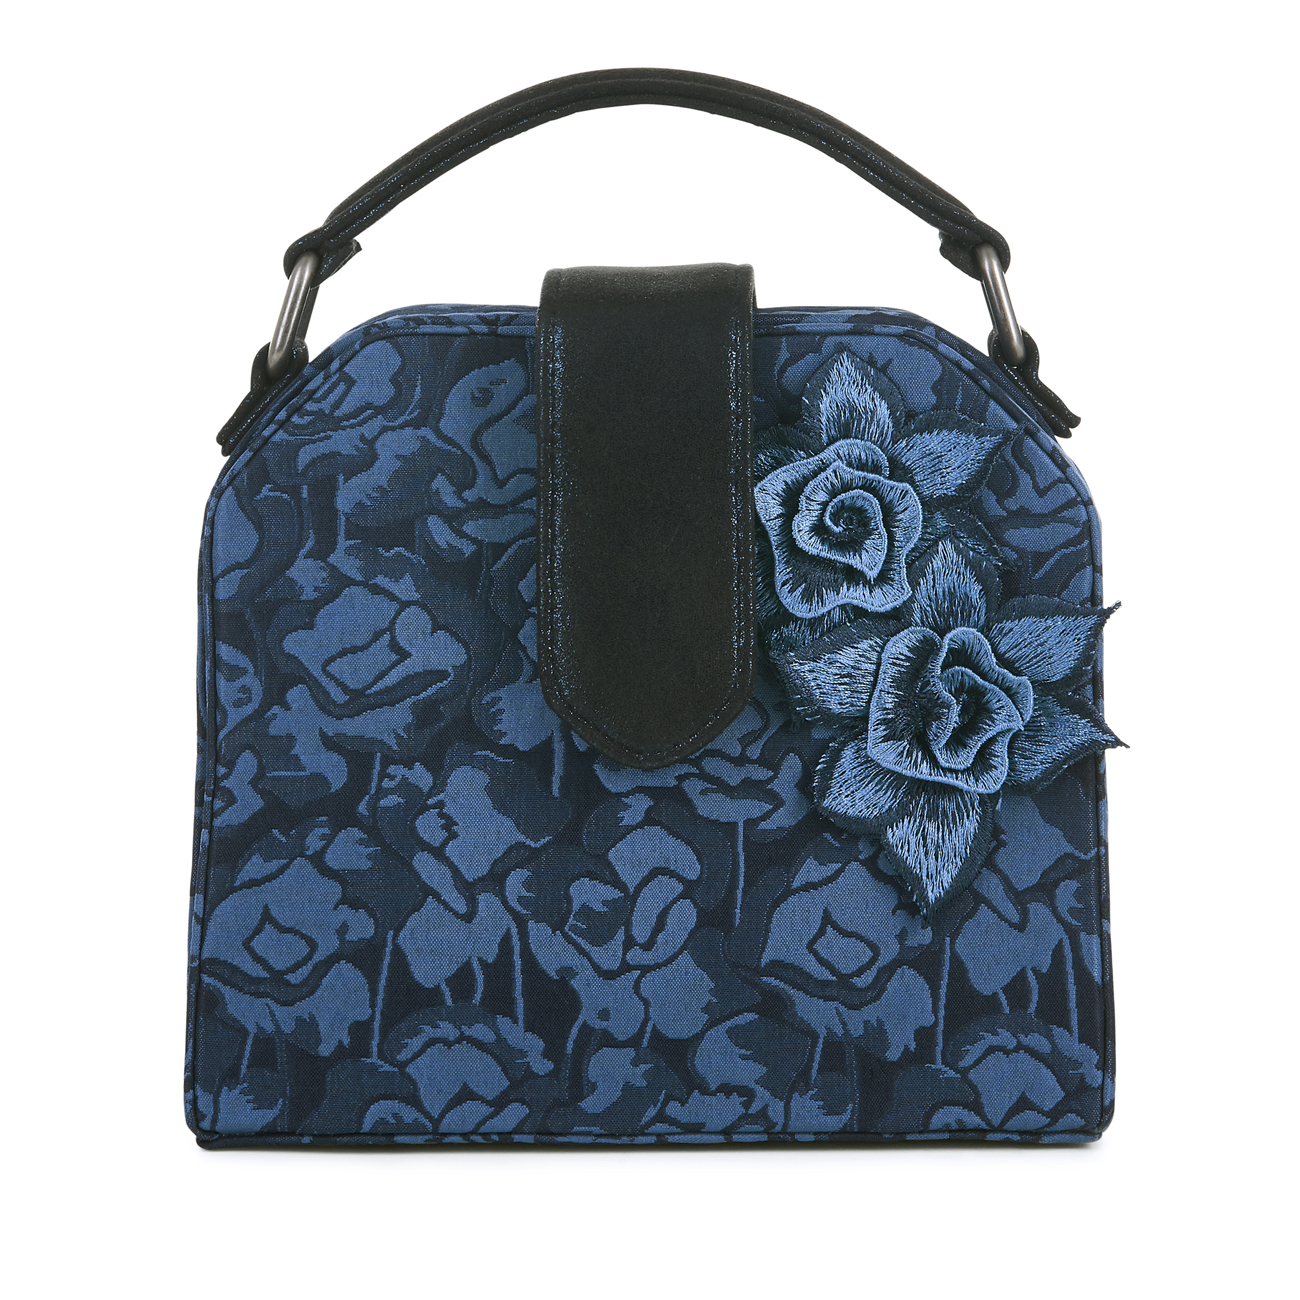 Ruby shoo quebec navy blue flower corsage handbag occasion evening picture 2 of 3 izmirmasajfo